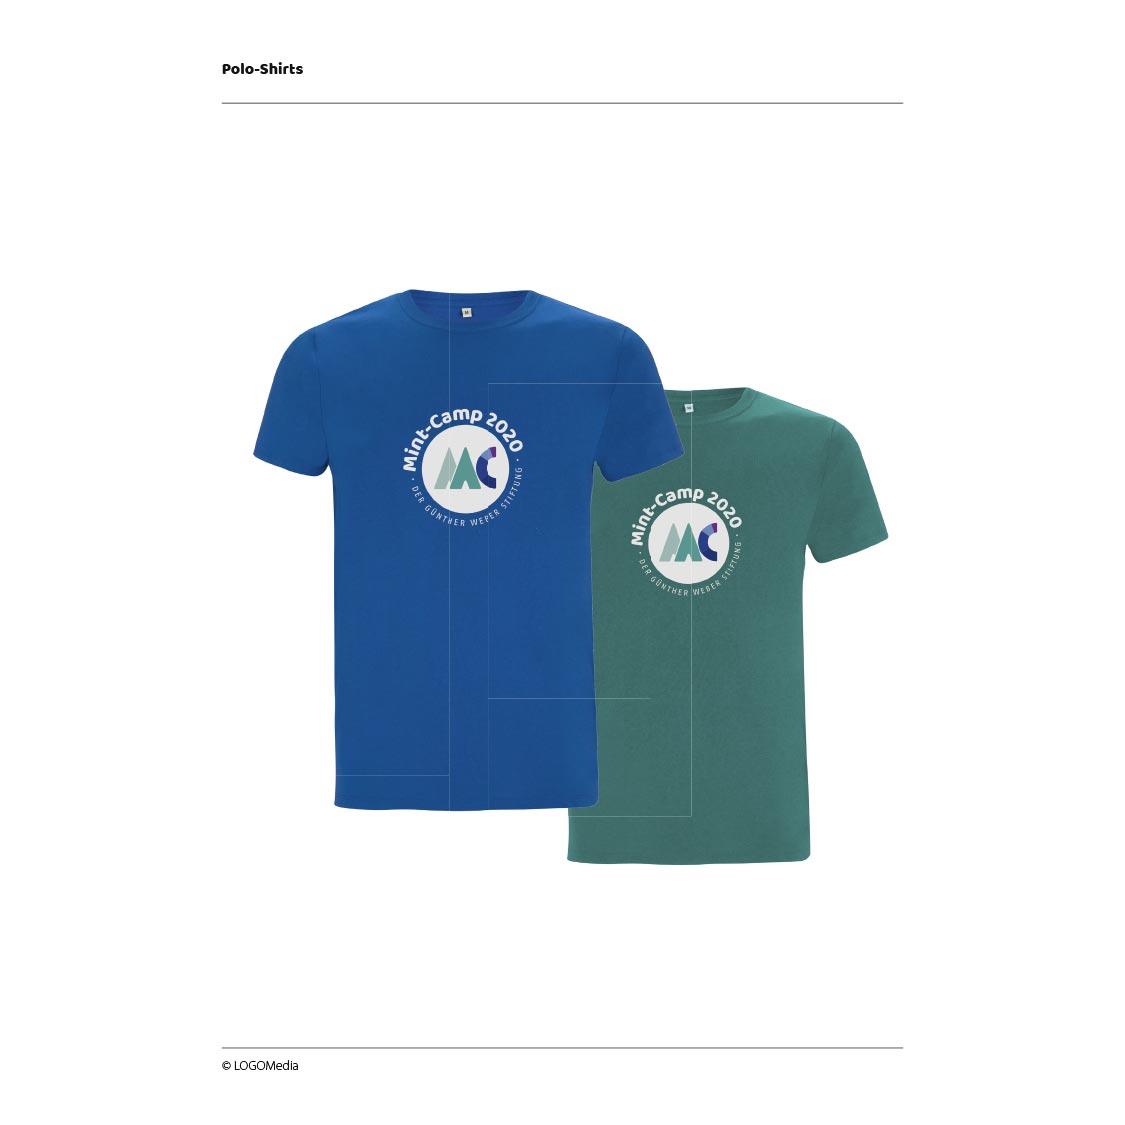 05 logo mint camp 2020 t shirts 1125px